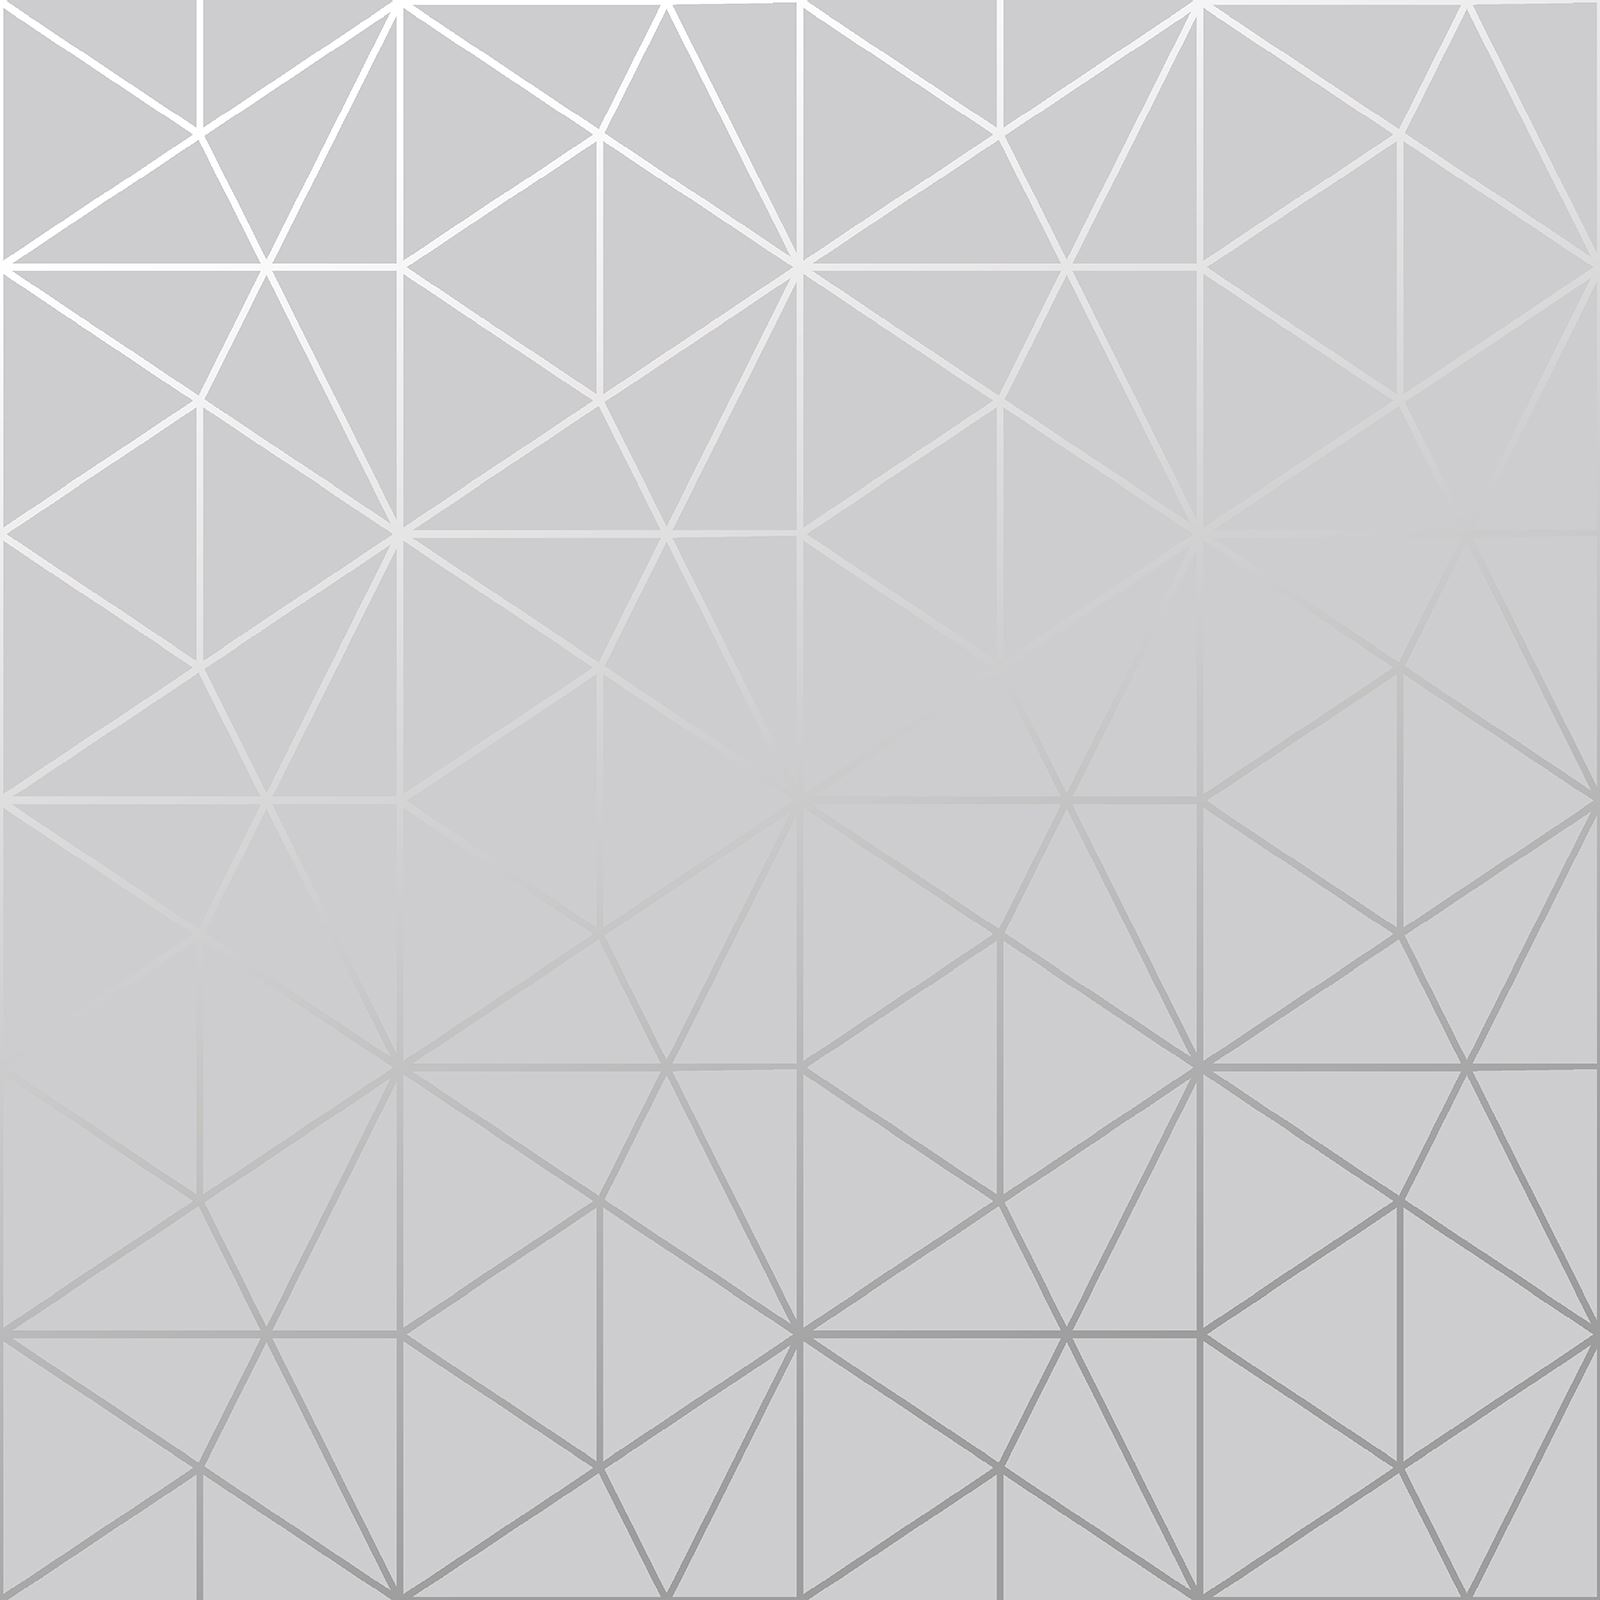 Geometric Metallic Wallpaper Decor Apex Metro Rose Gold Copper